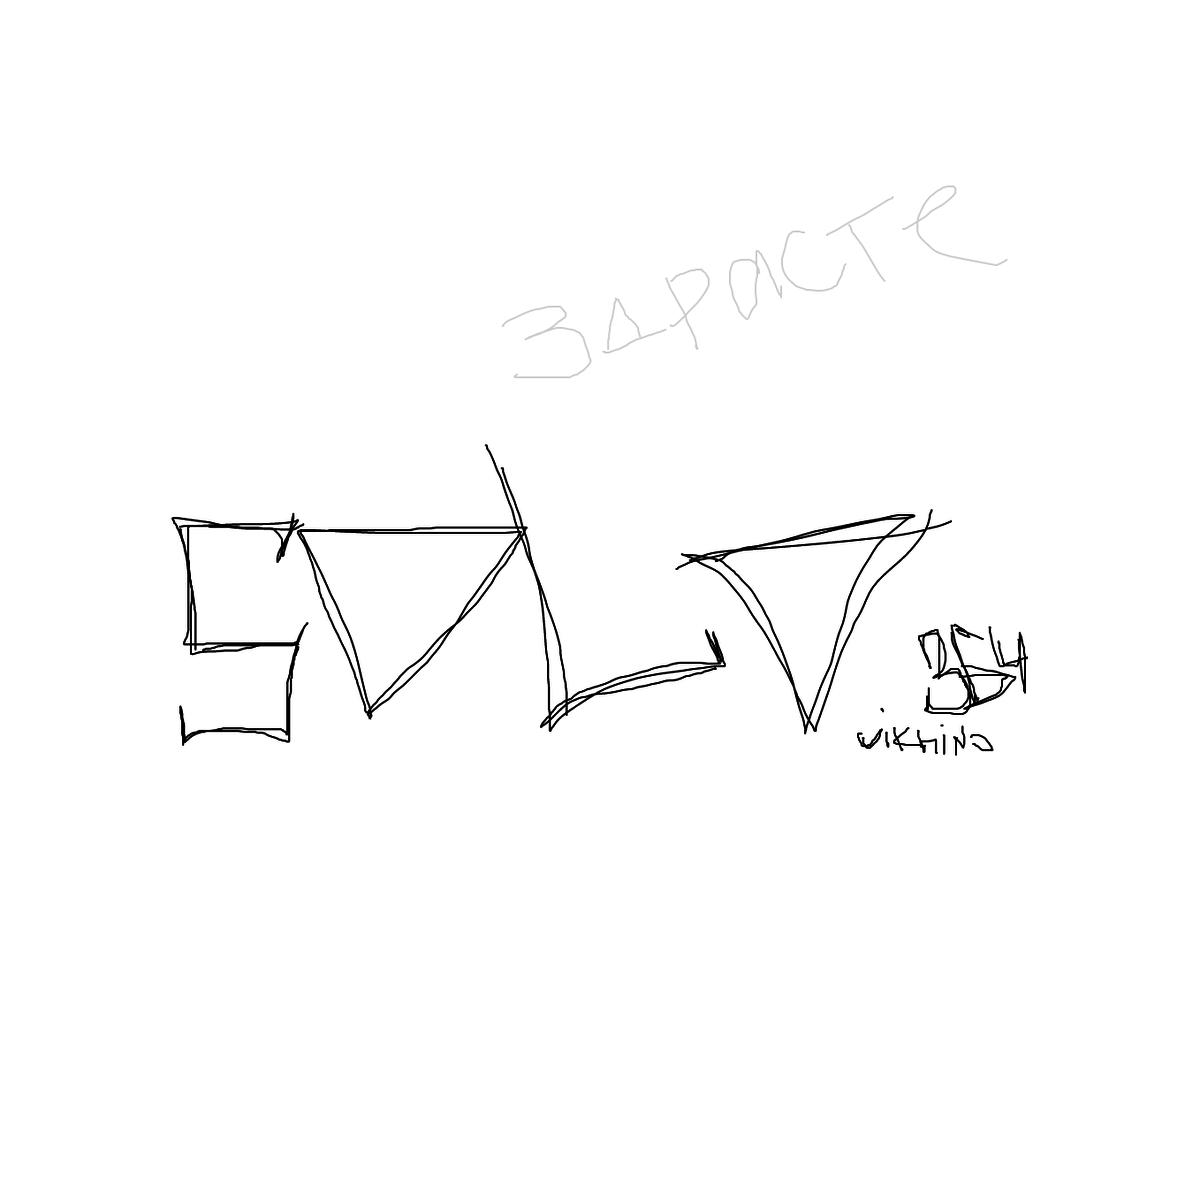 BAAAM drawing#22301 lat:55.7520828247070300lng: 37.6202354431152340